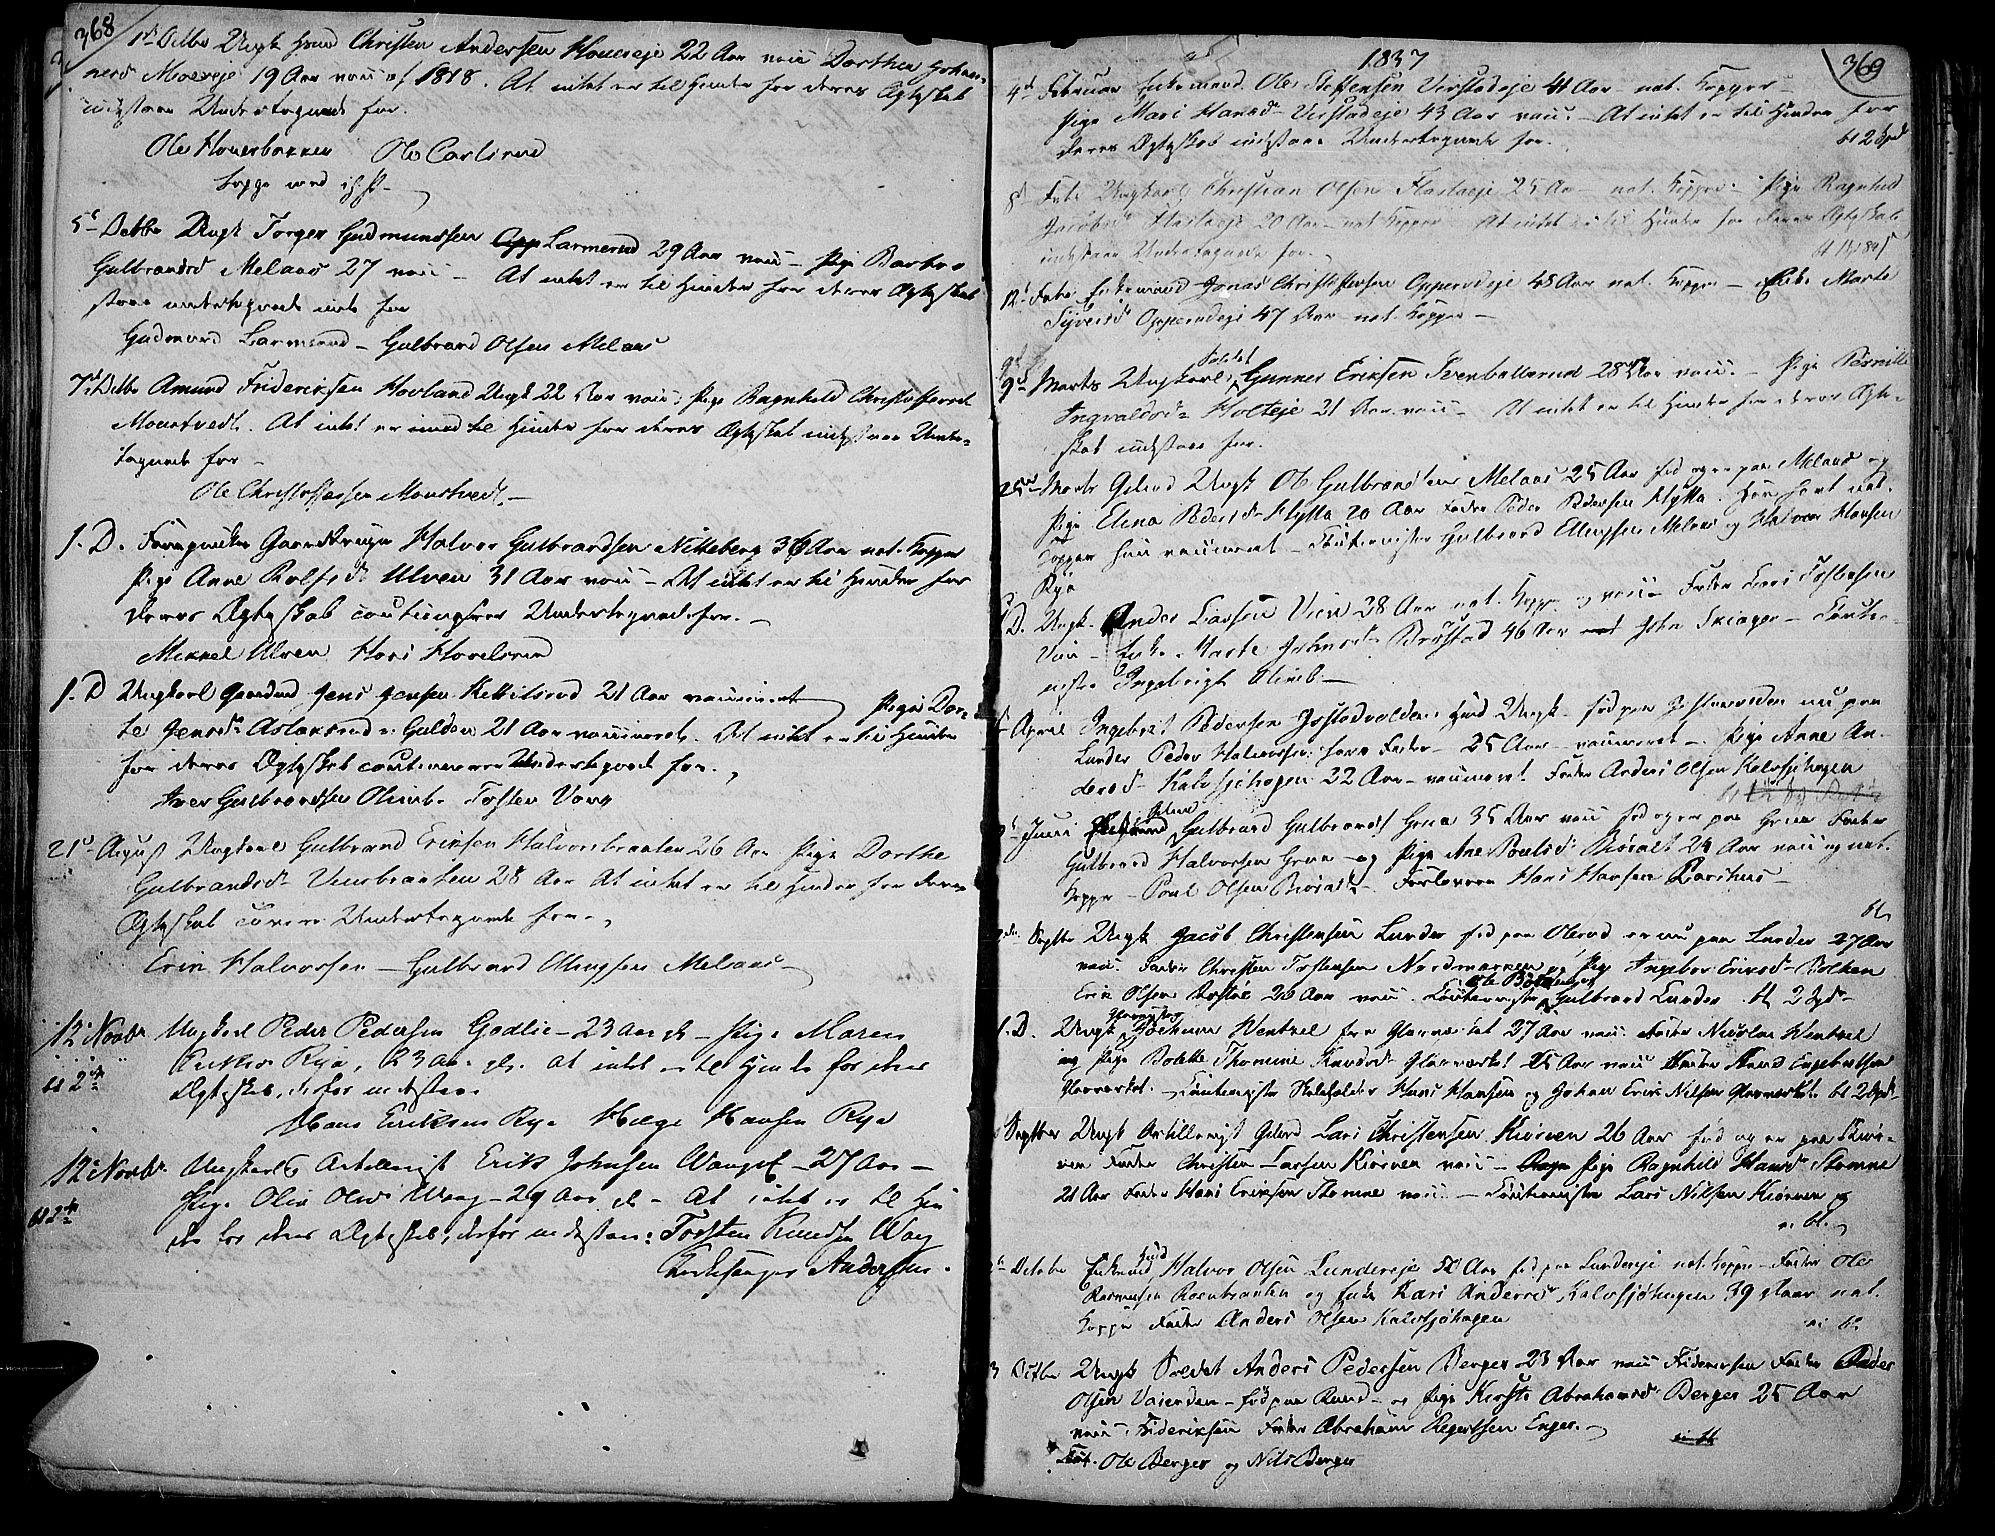 SAH, Jevnaker prestekontor, Ministerialbok nr. 4, 1800-1861, s. 368-369